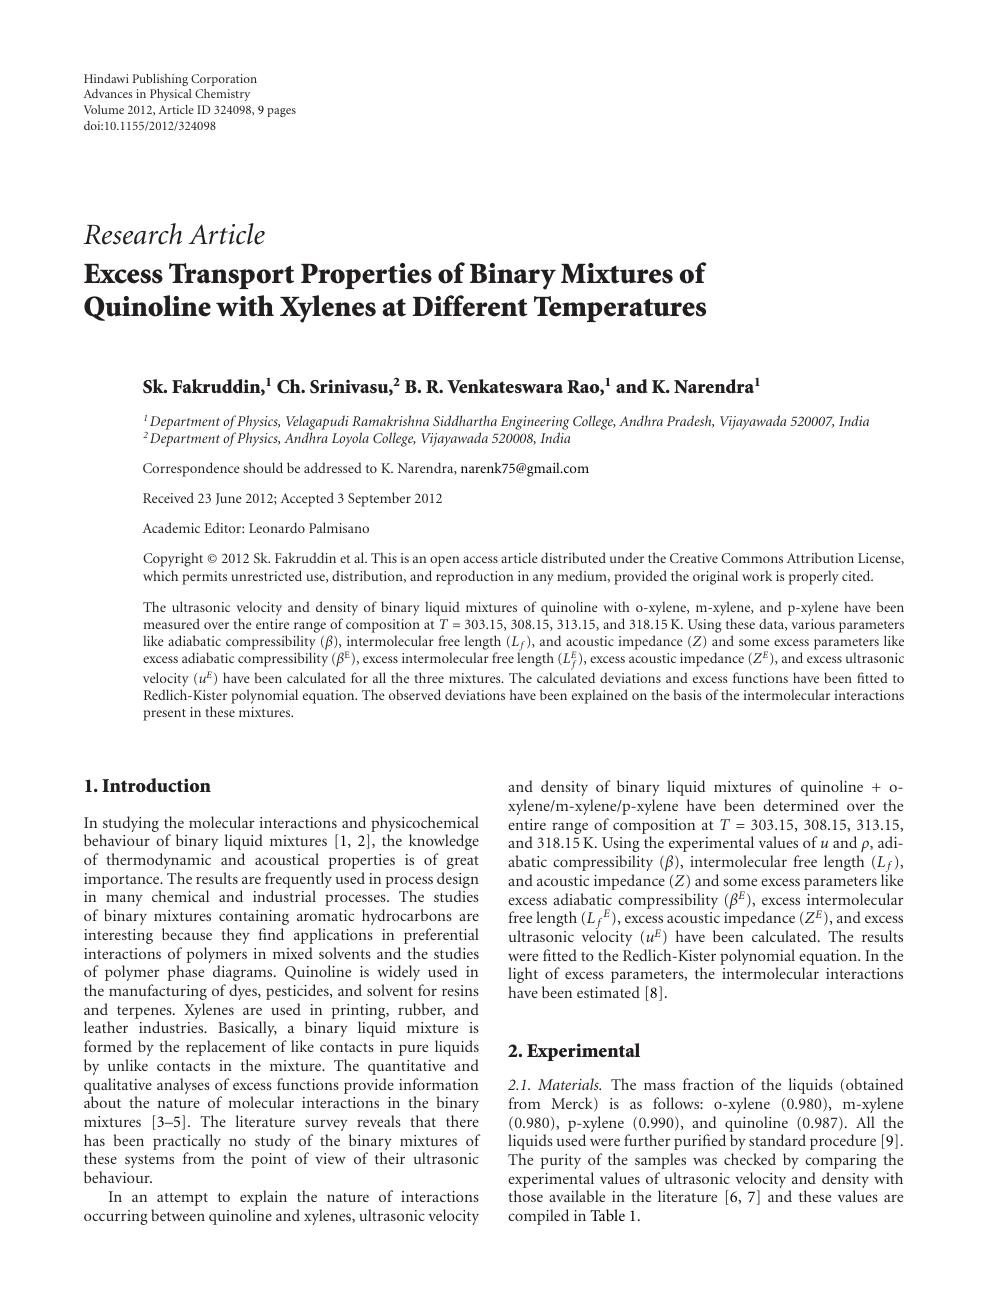 Excess Transport Properties of Binary Mixtures of Quinoline with